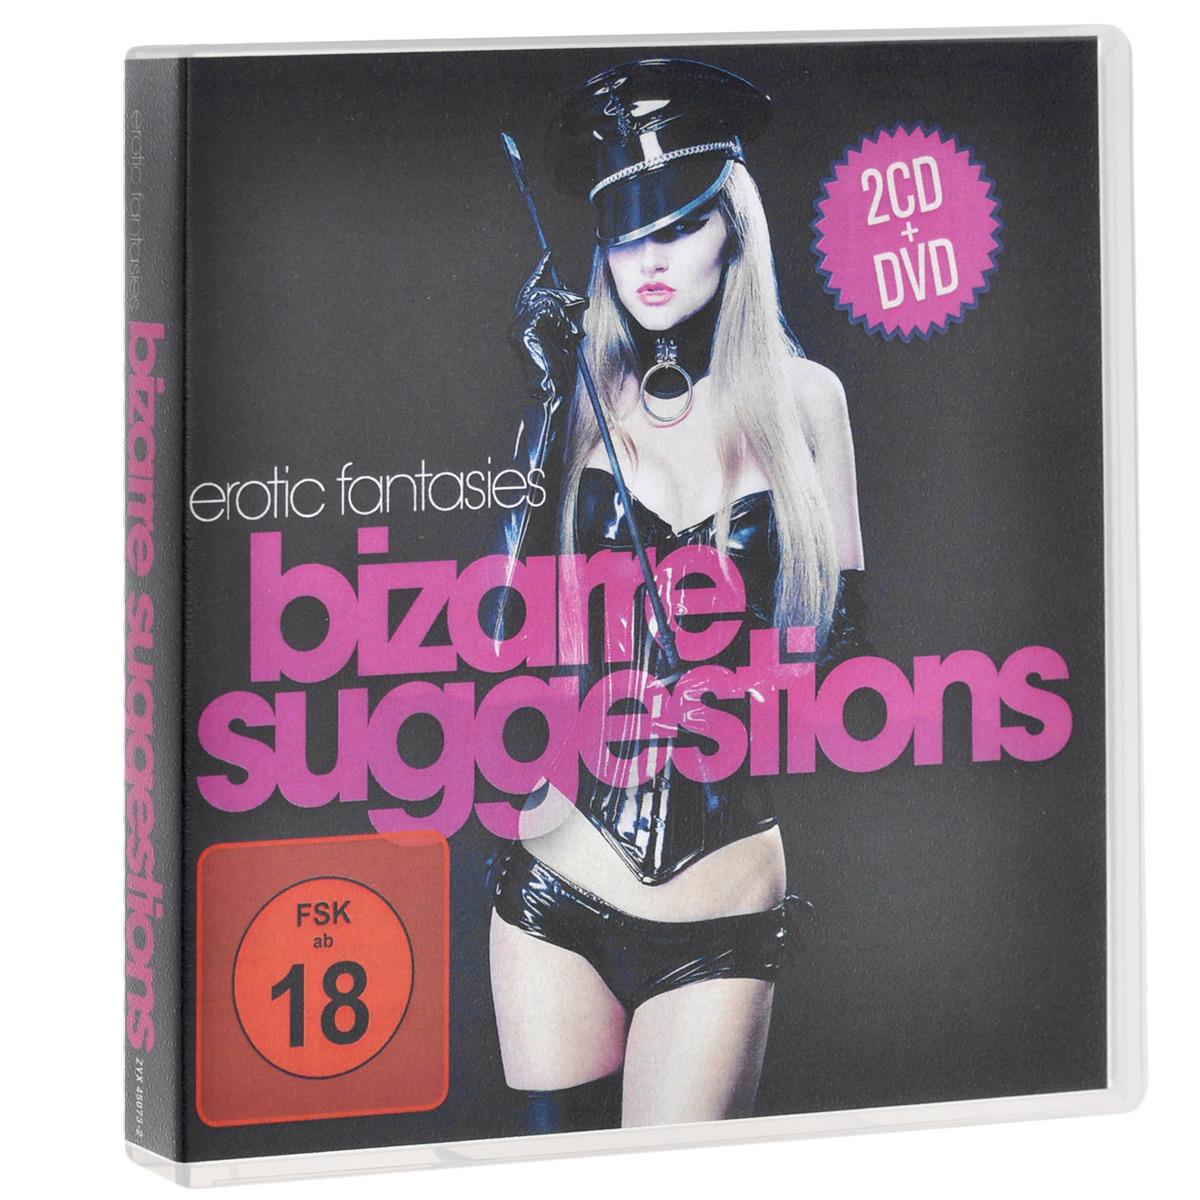 Erotic Fantasies Bizarre Suggestions (2 CD + DVD)